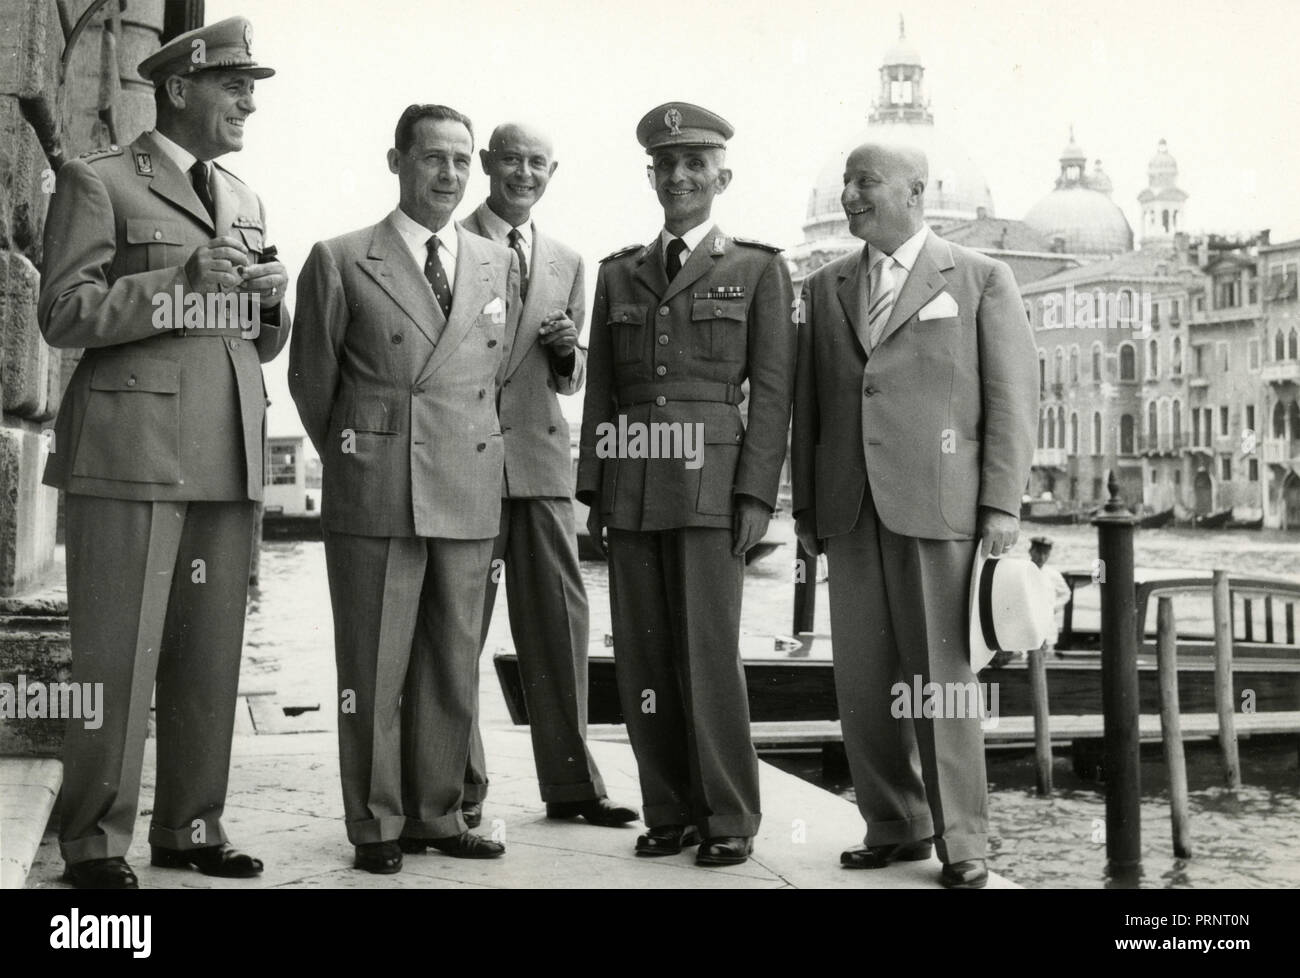 Finanzpolizei, Venedig, Italien 1955 Stockbild